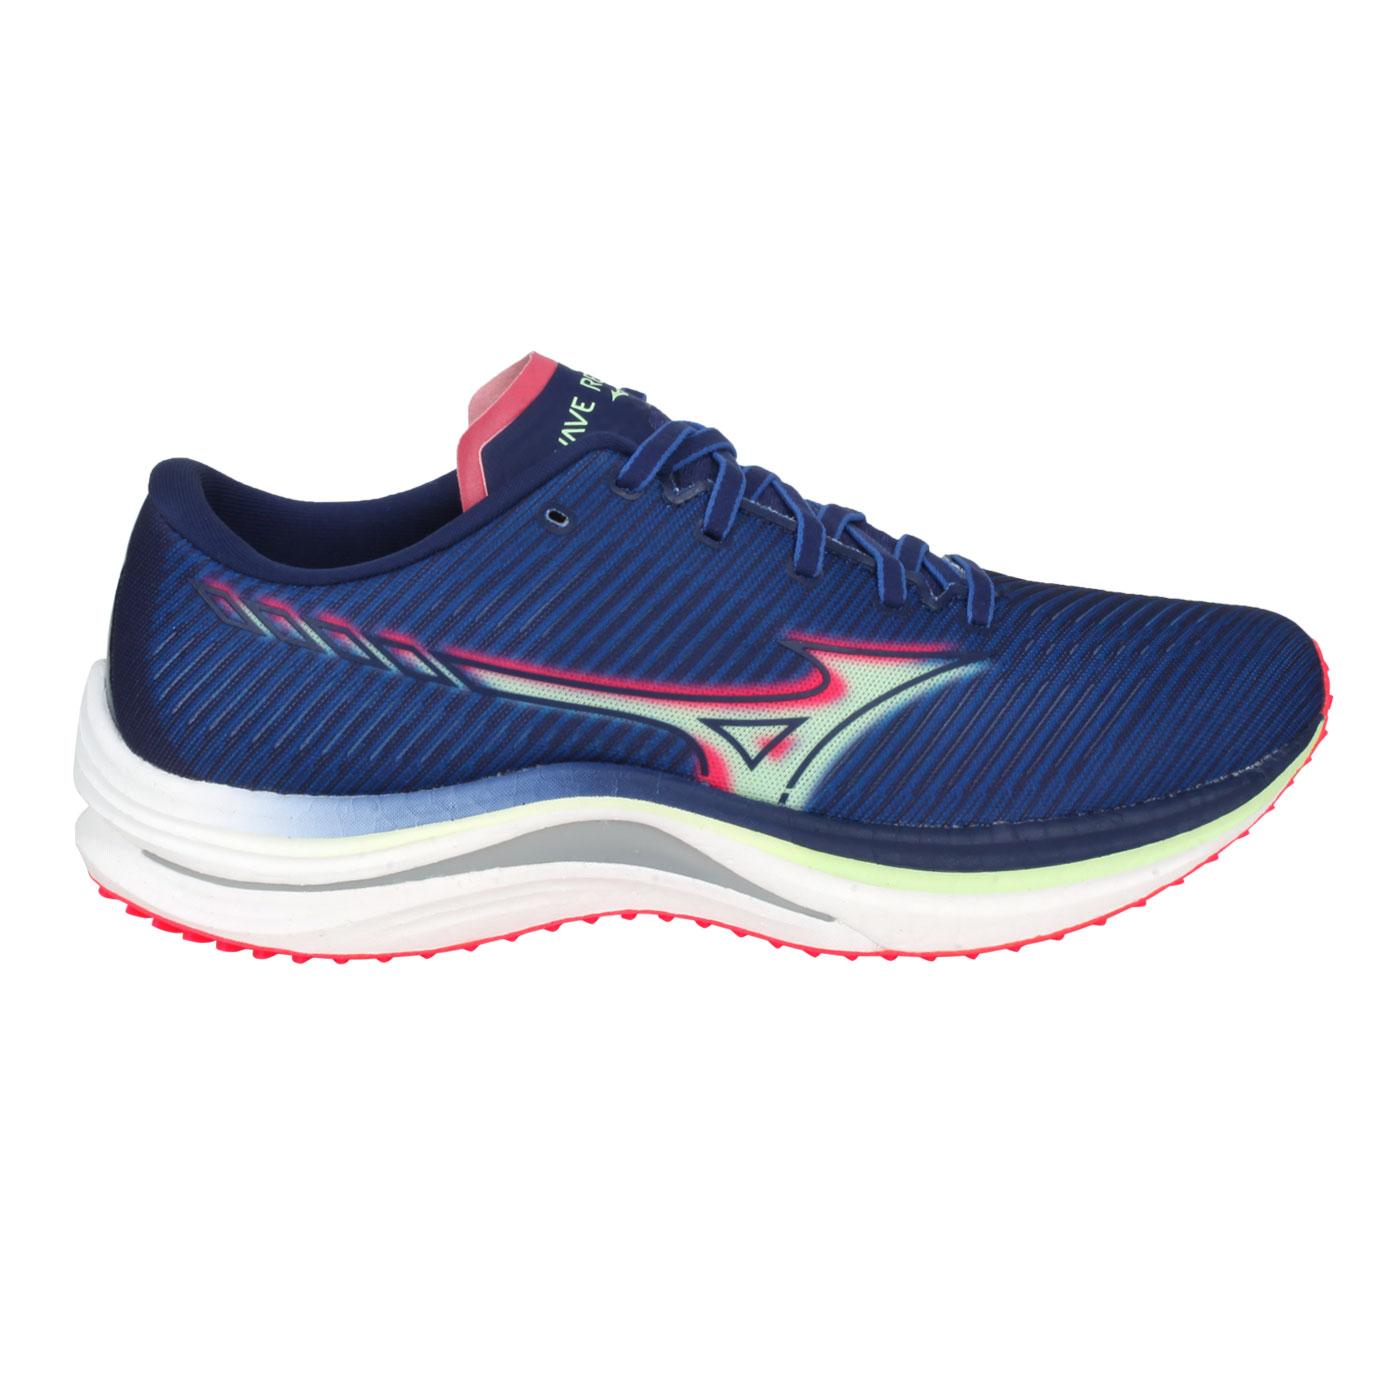 MIZUNO 男款路跑鞋  @WAVE REBELLION@J1GC211783